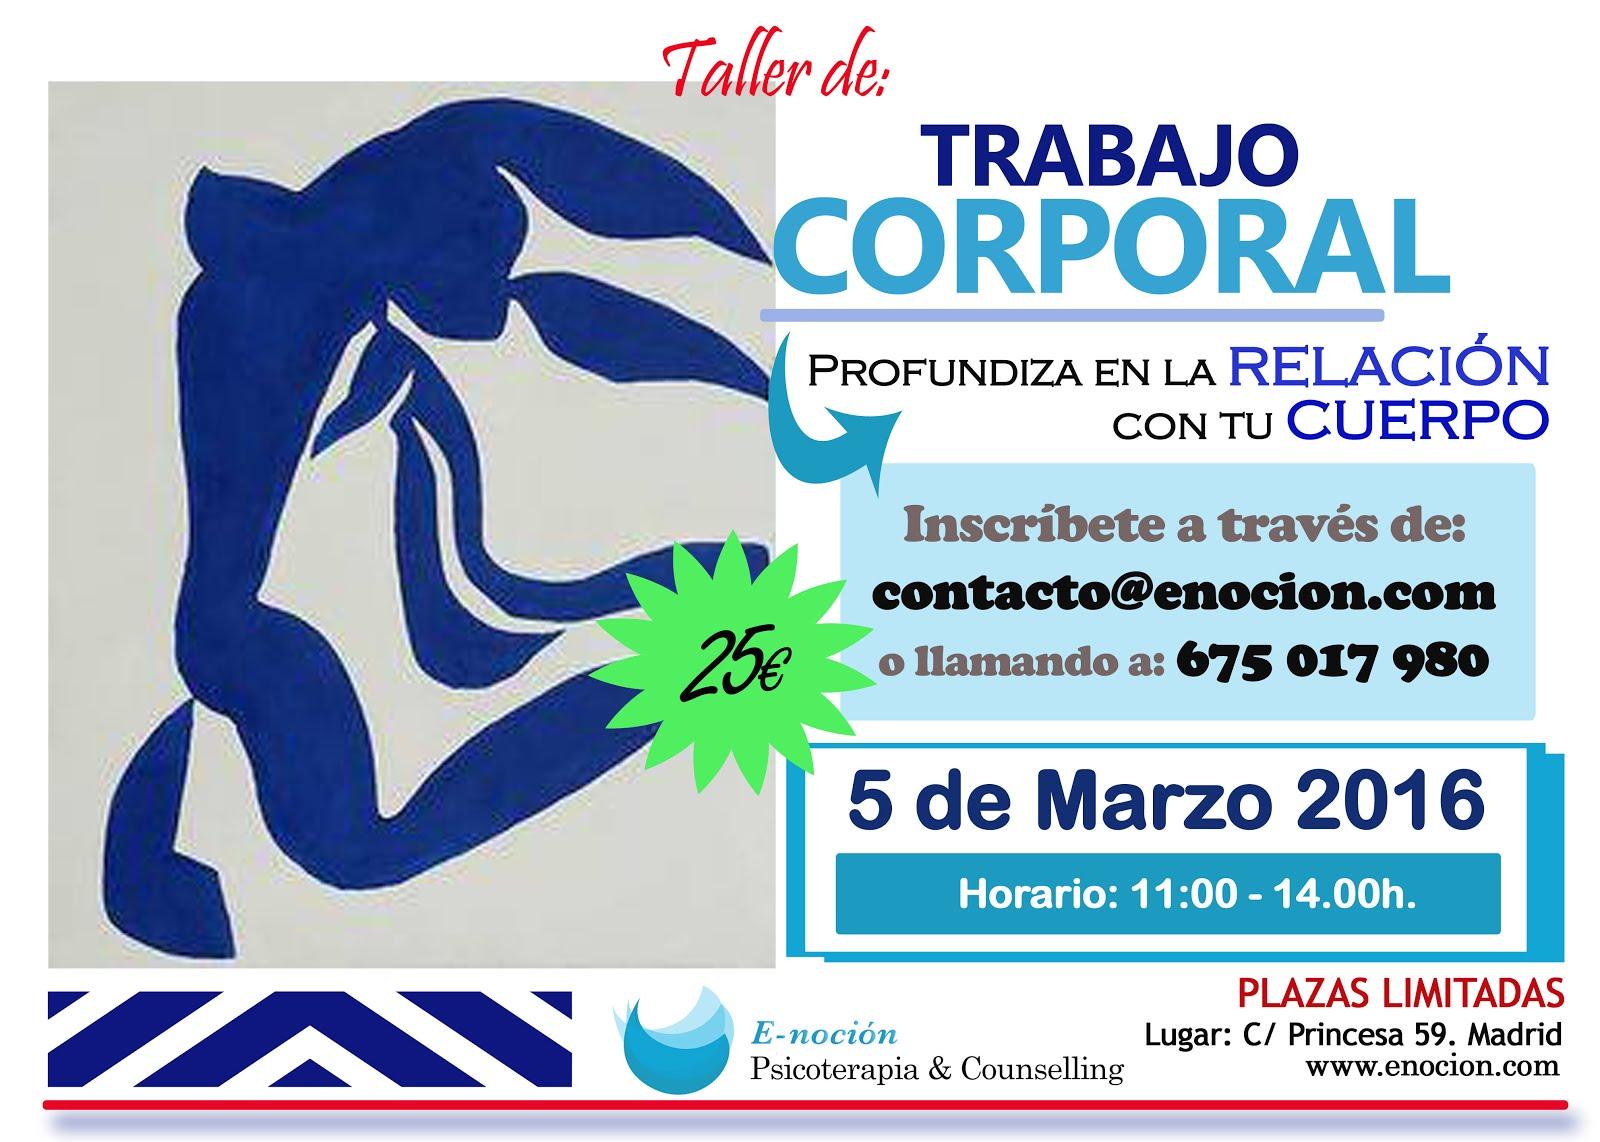 Trabajo Corporal Madrid